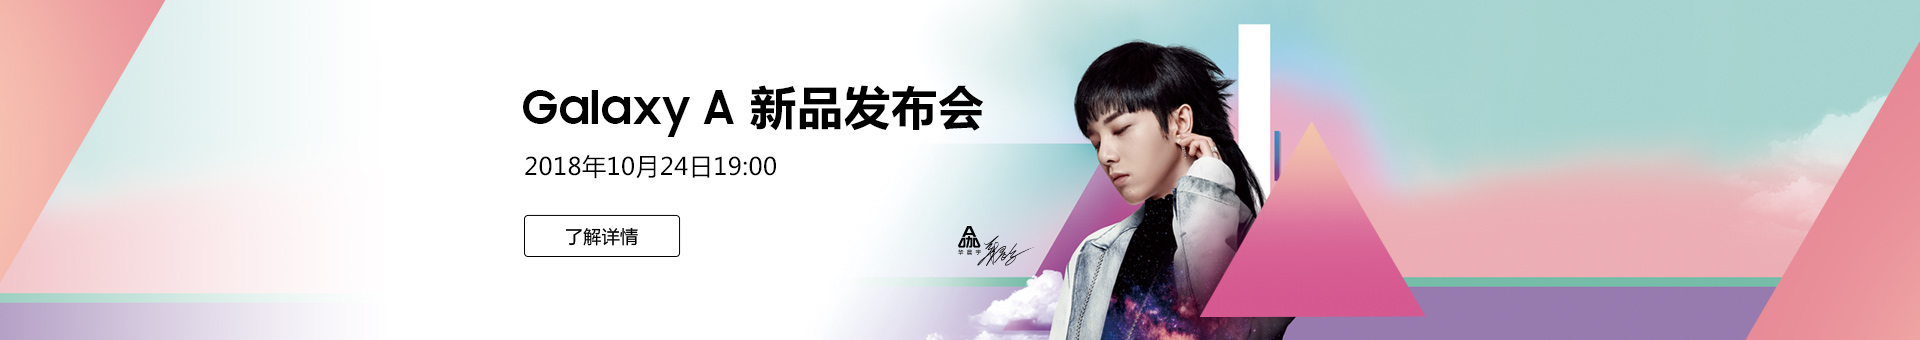 Galaxy A新品中国发布会 10月24日同步直播 敬请期待!